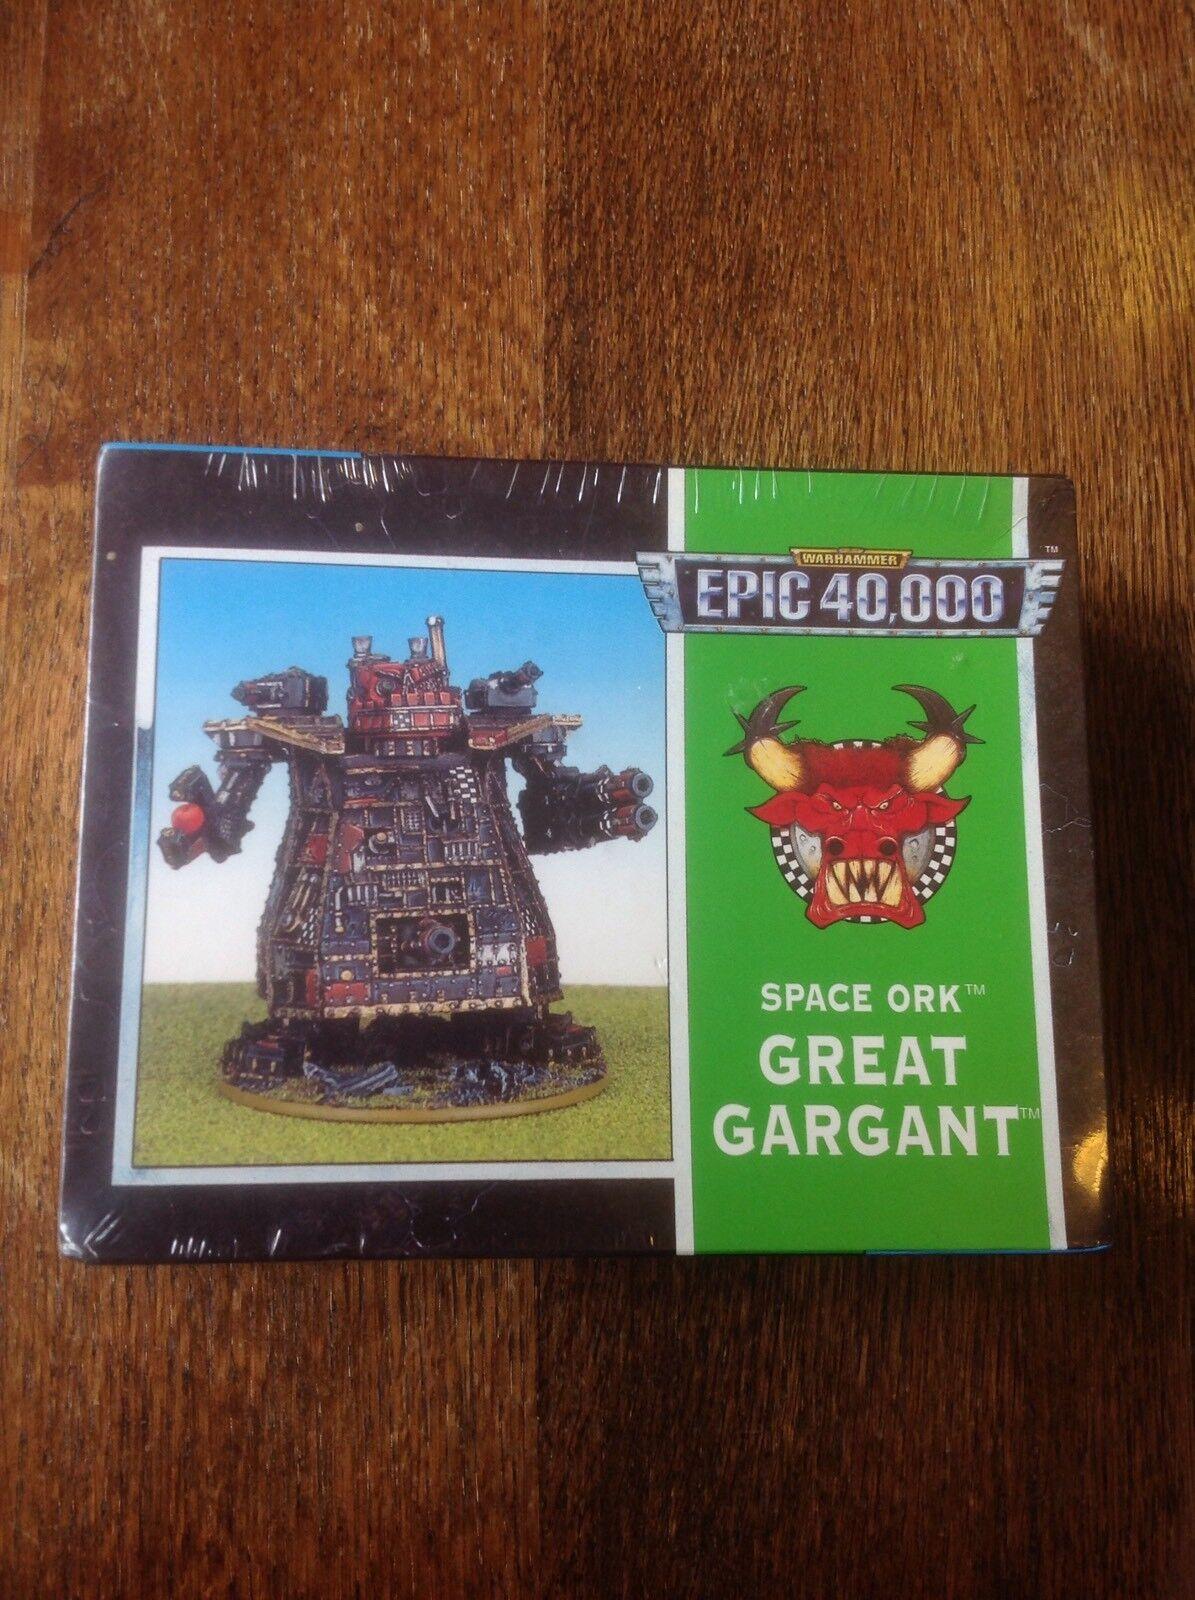 Warhammer Epic 40,000. Space Ork Great gargant. Métal & scellé.